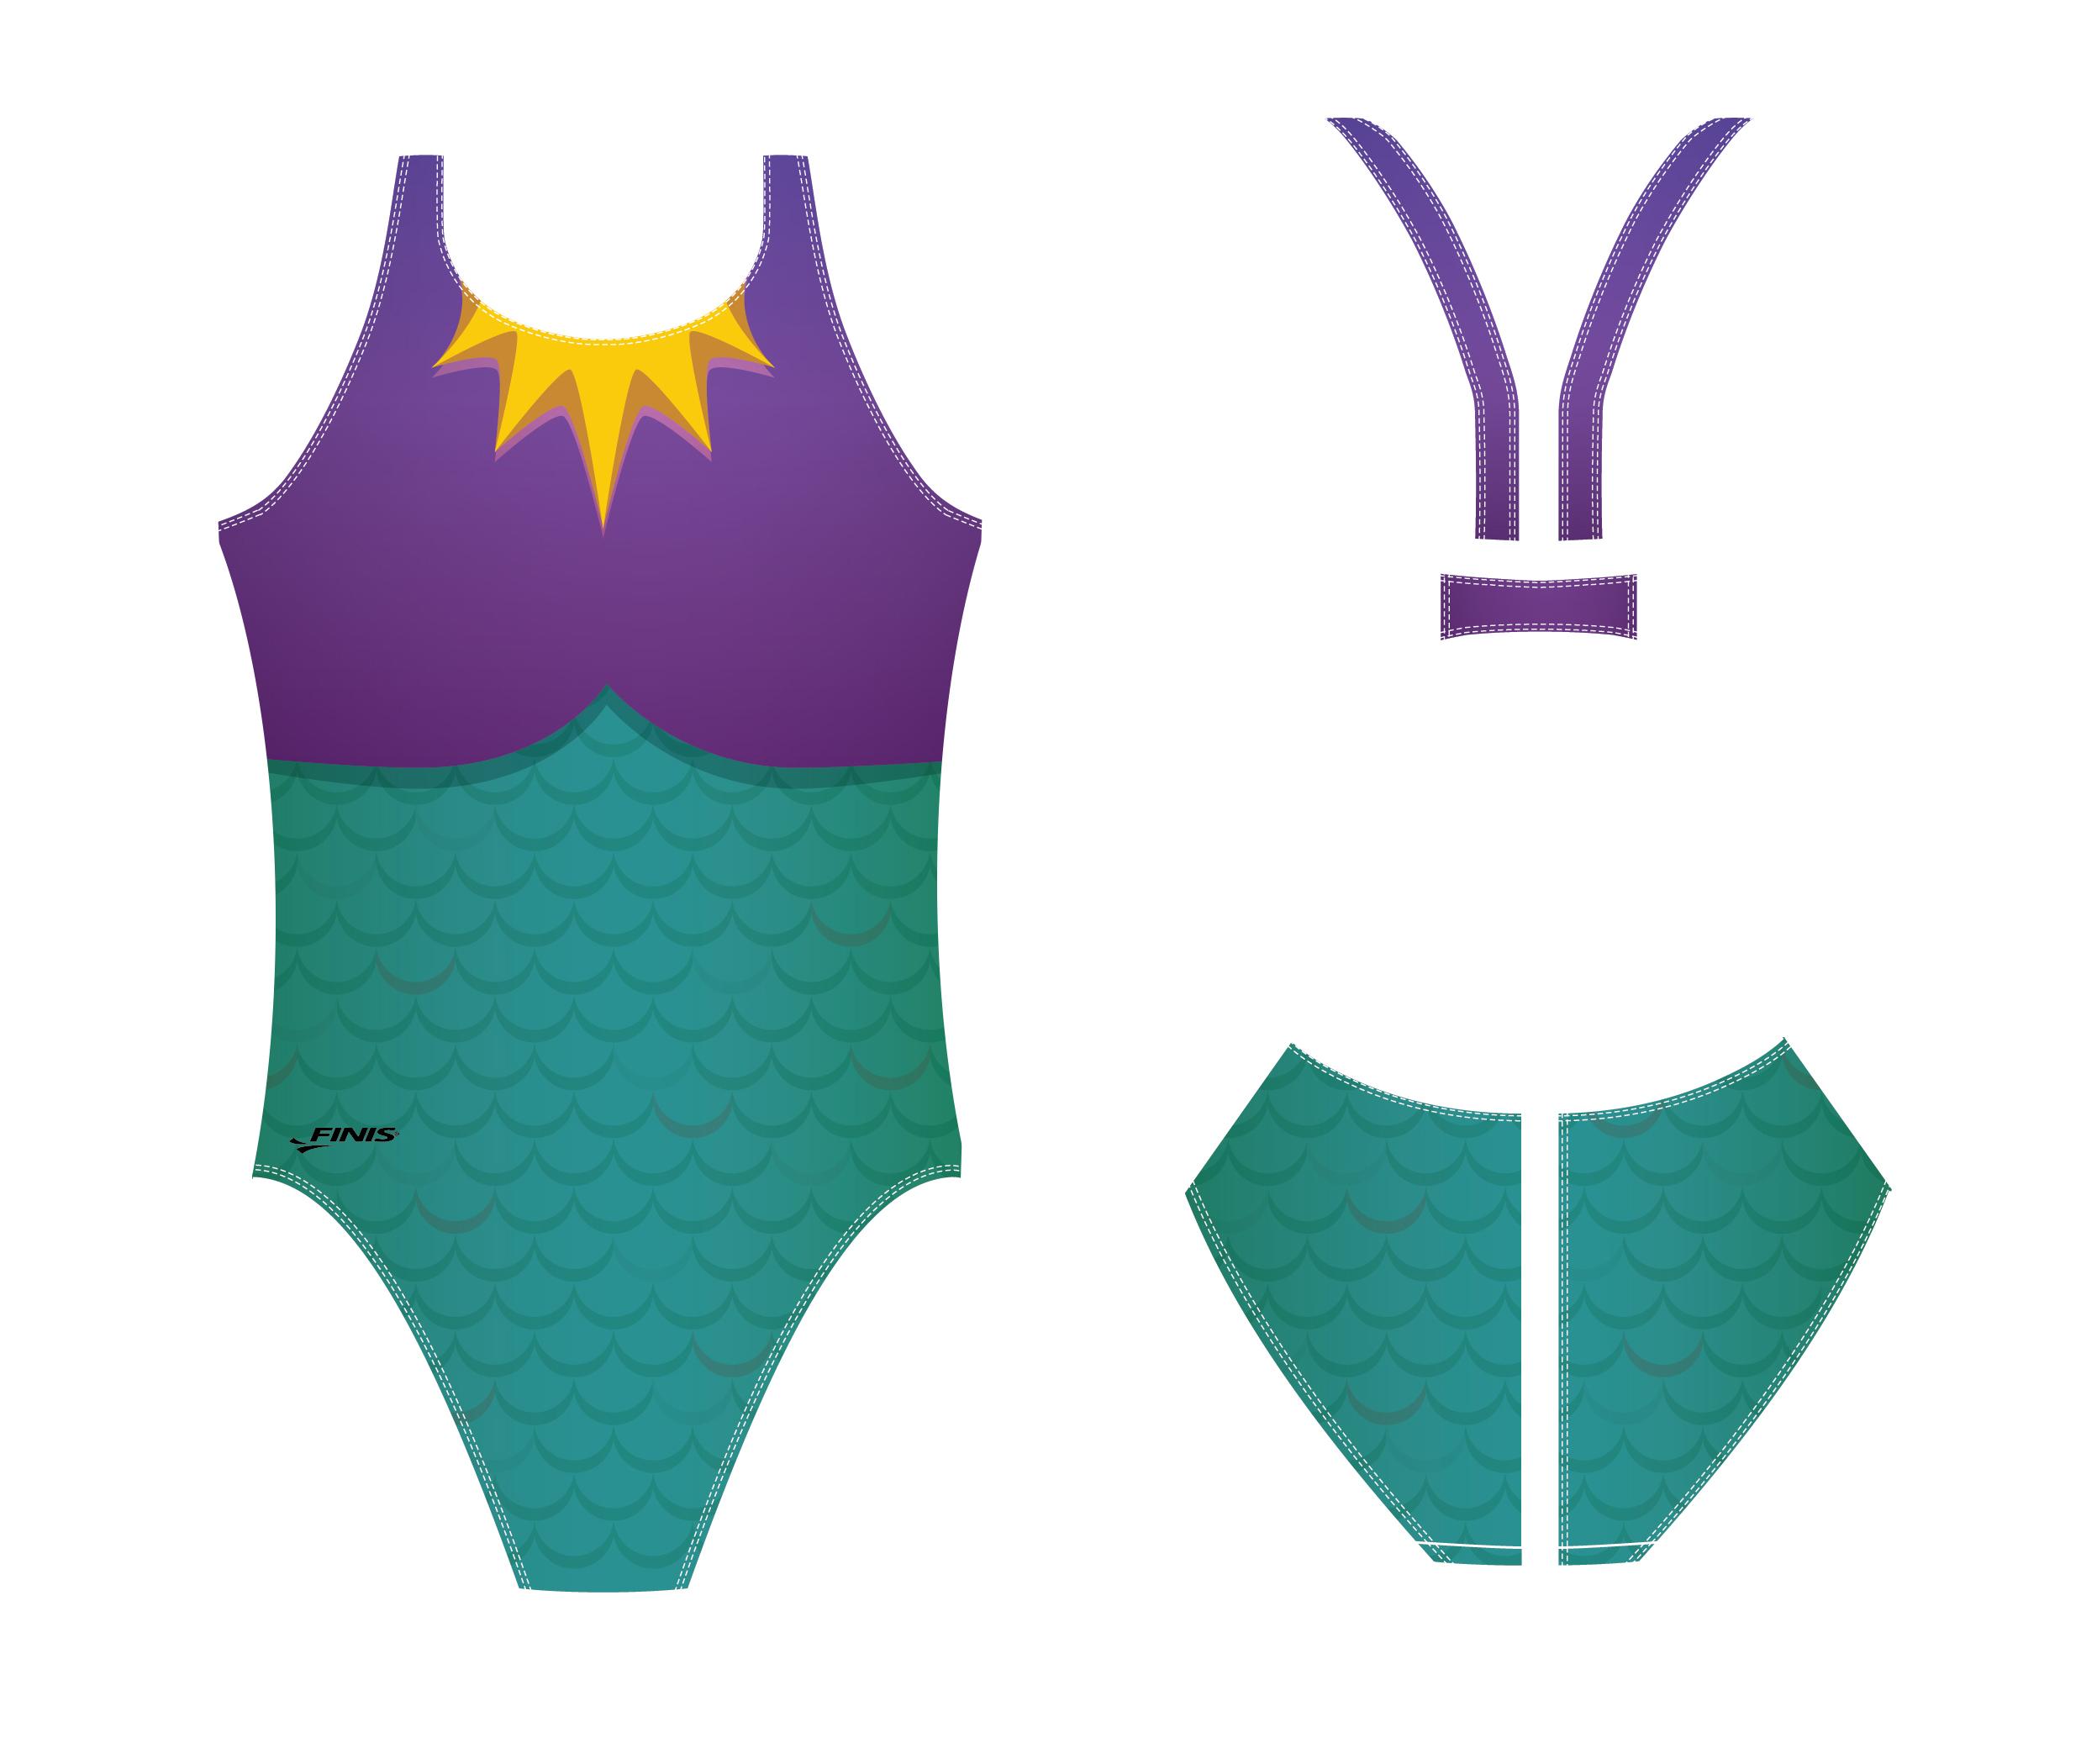 25x50swim-Bladeback-Design-Mermaid-Mask.jpg